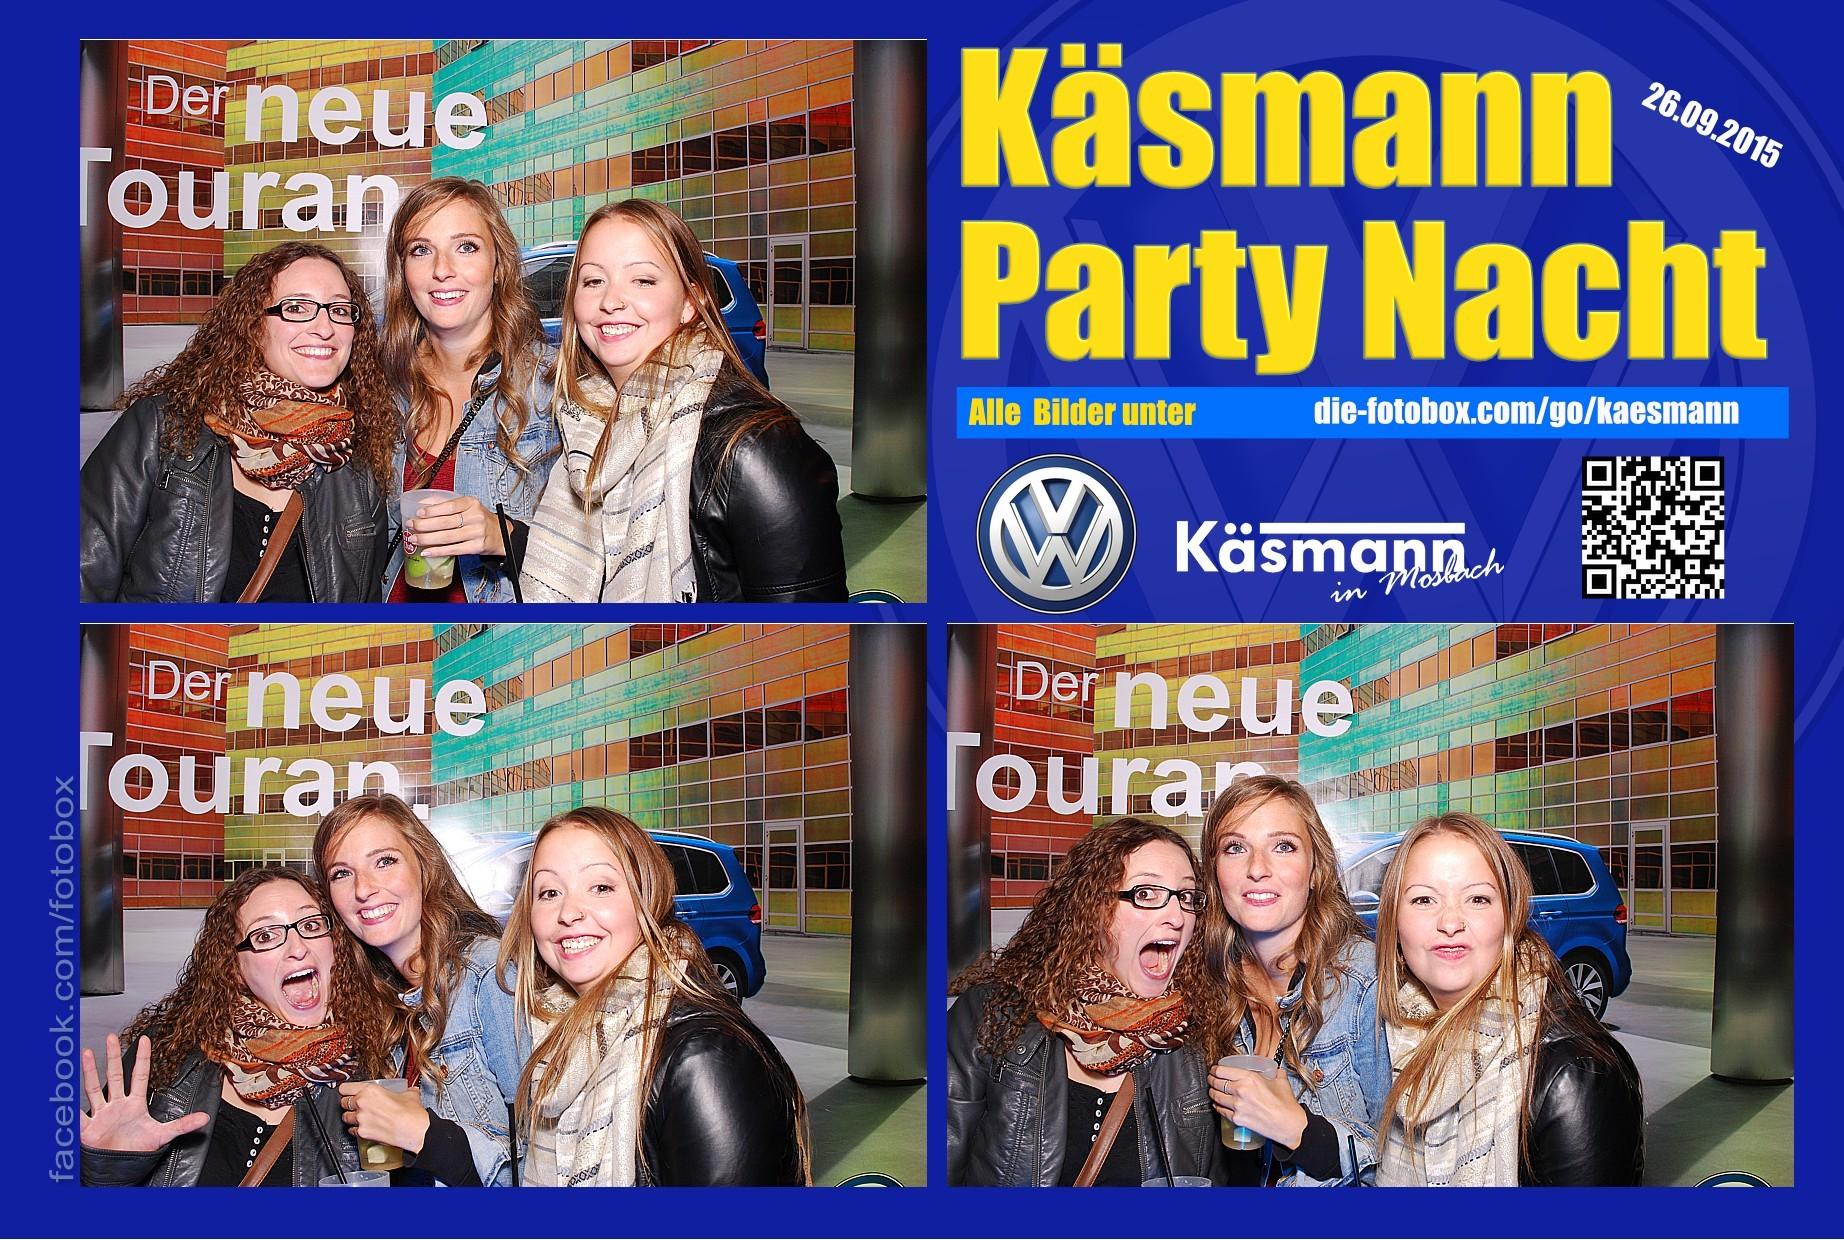 Käsmannparty 2015 - www.die-fotobox.com 01389